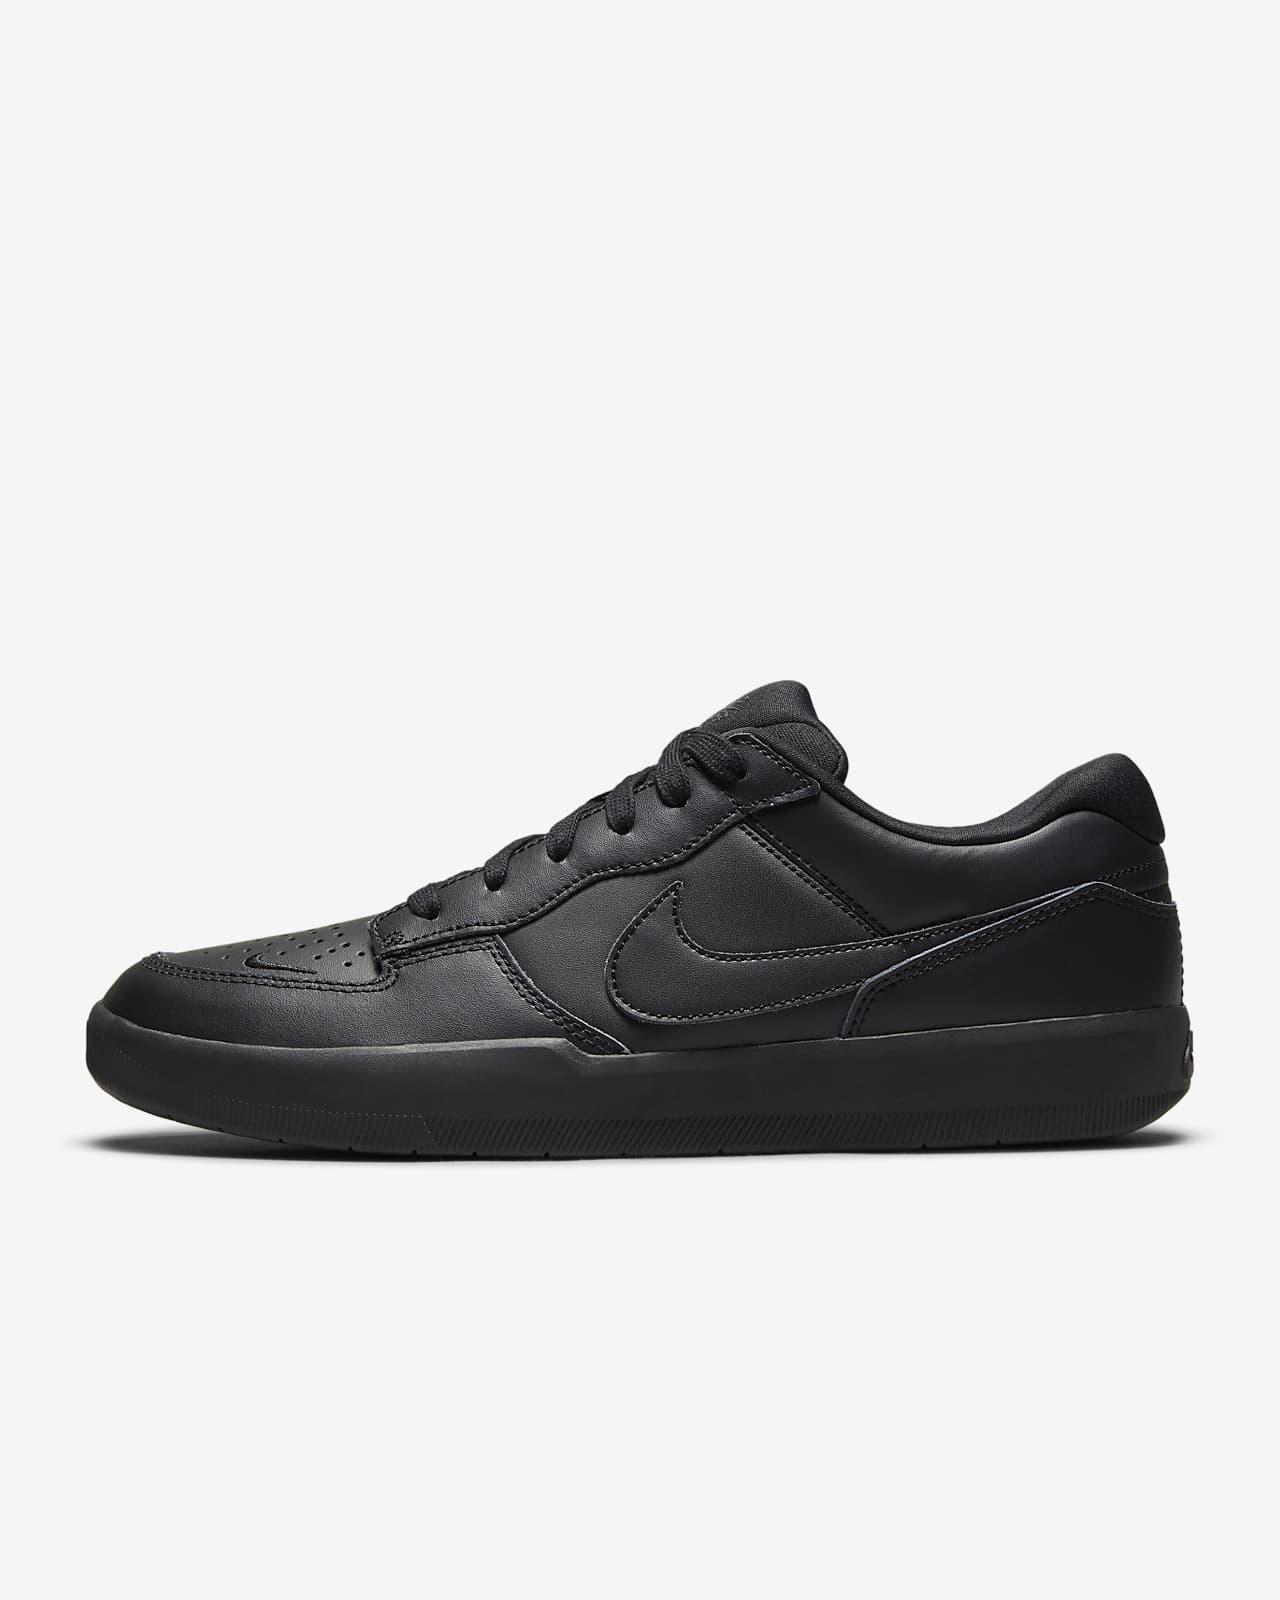 Chaussure de skateboard Nike SB Force 58 Premium